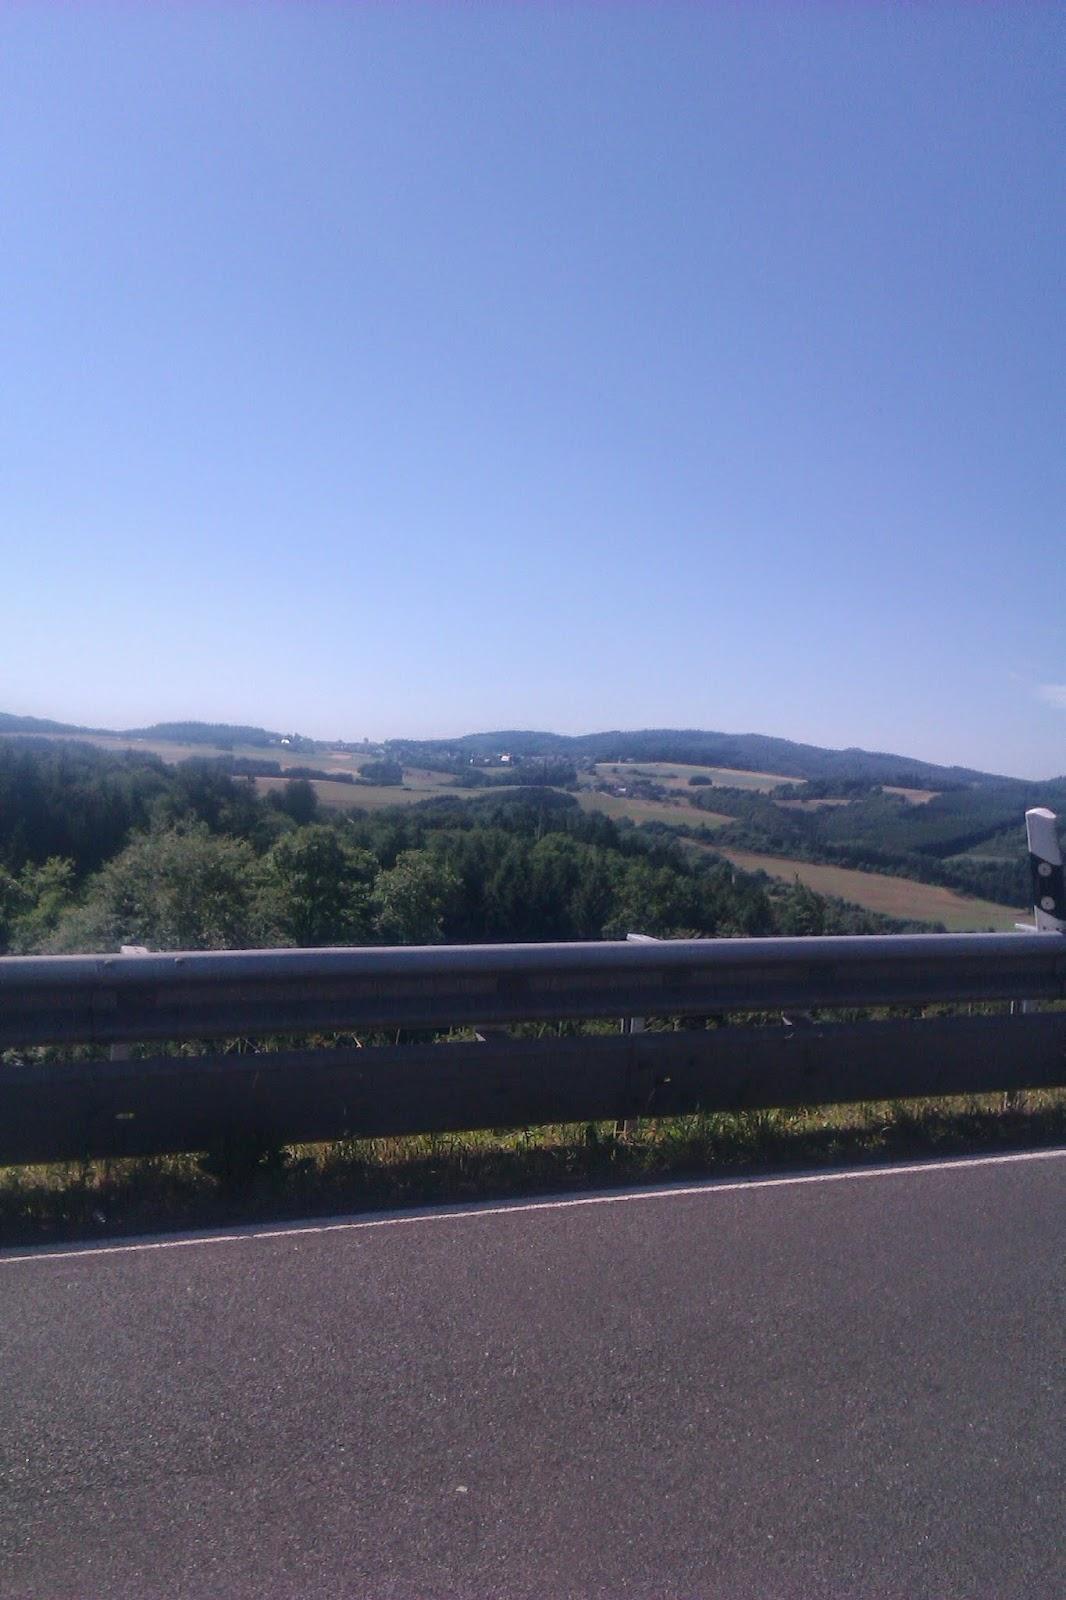 From Blankenheim to Koblenz